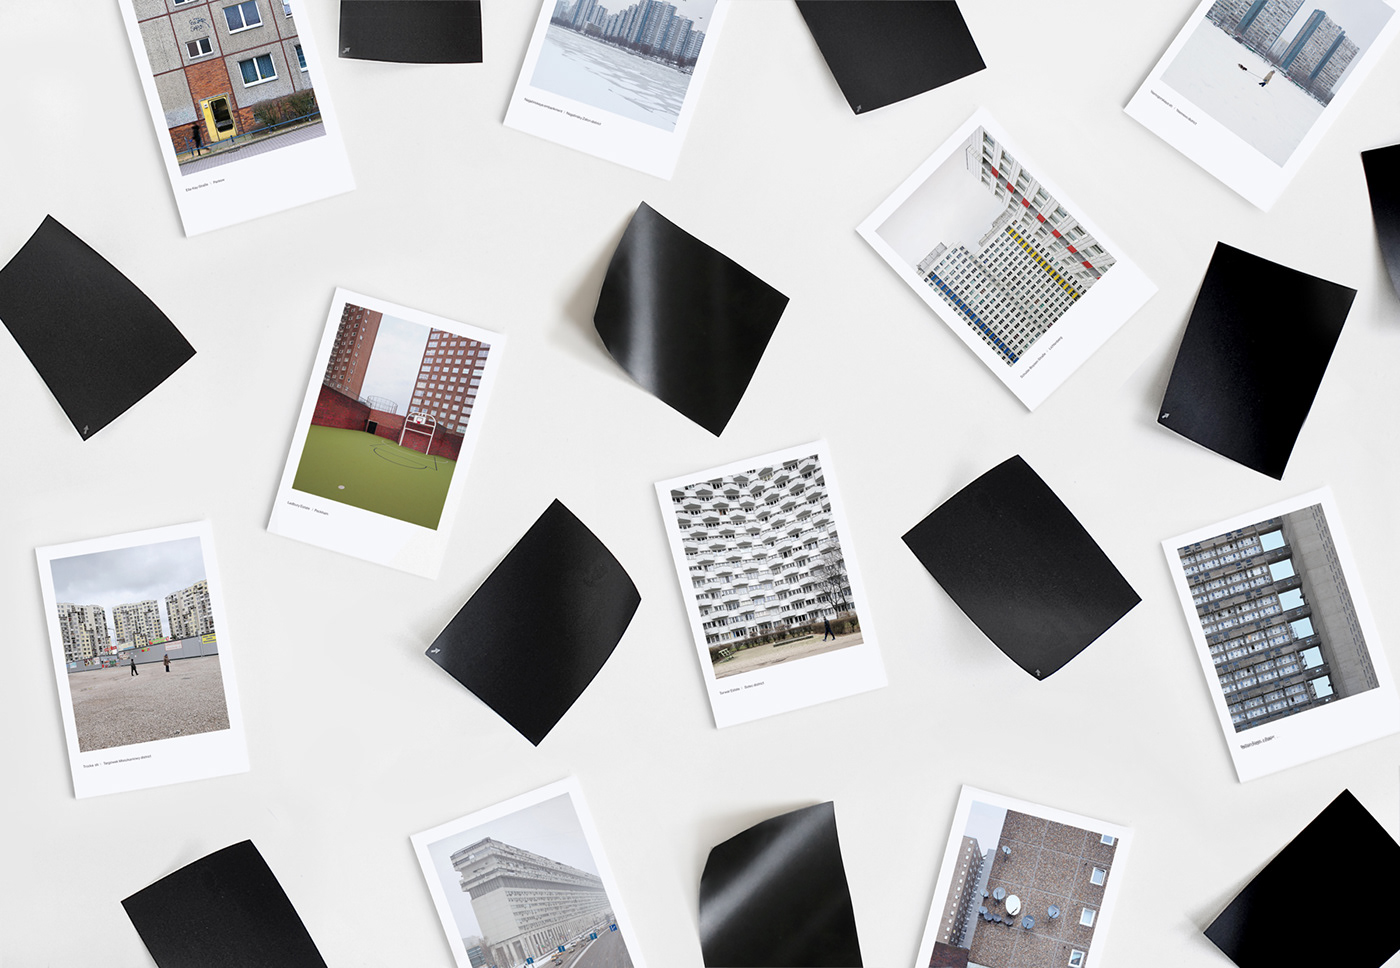 Brutalism,postwar,modernism,architecture,snapshots,POLAROID,eastern bloc